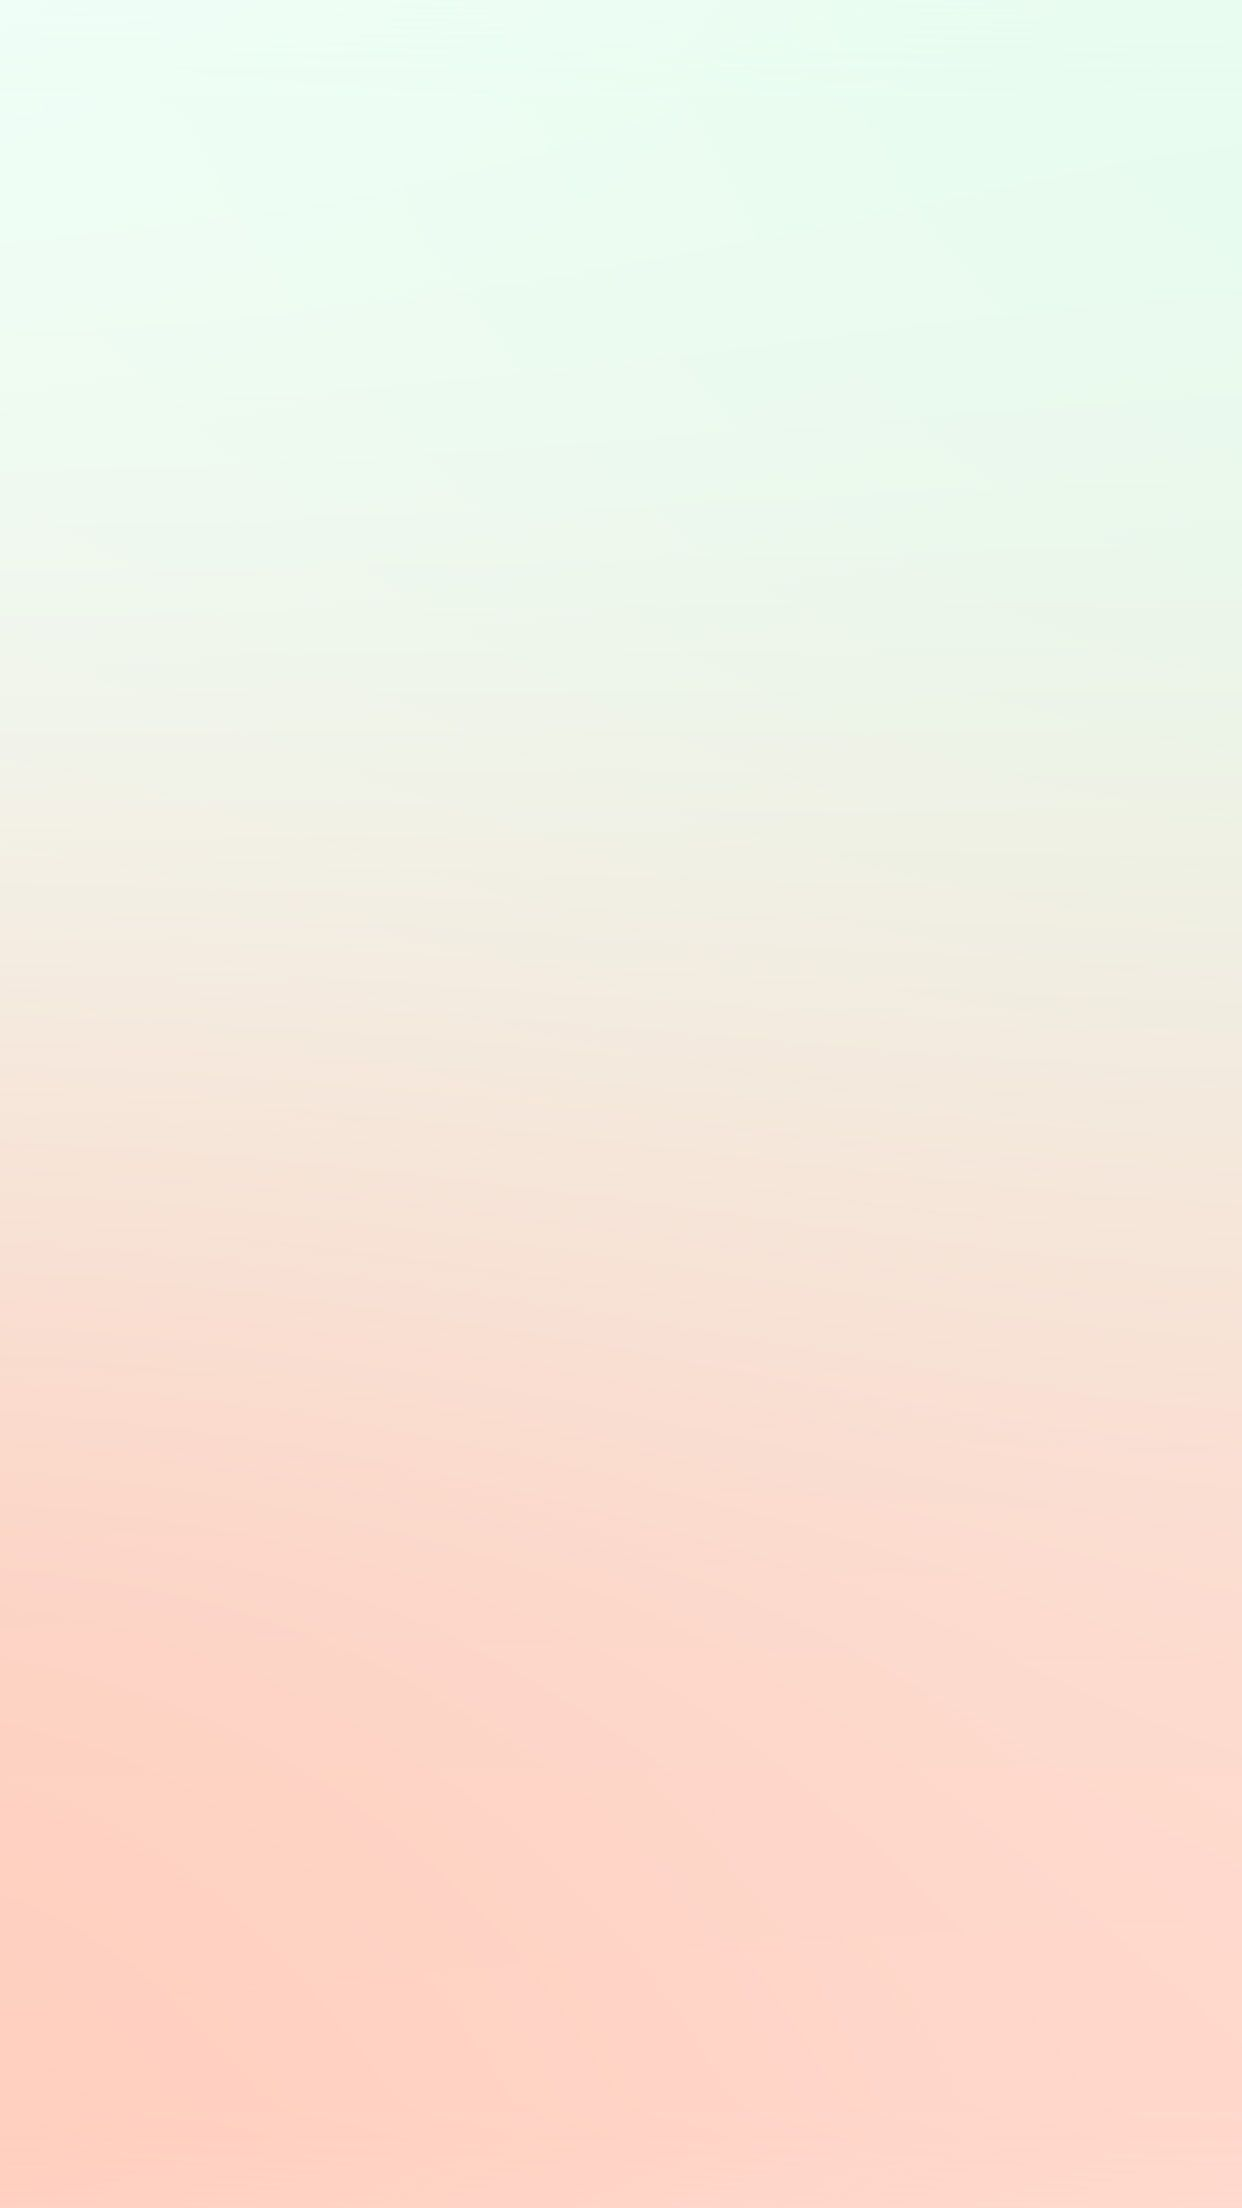 Minimalist Pastel Gradient iPhone ...